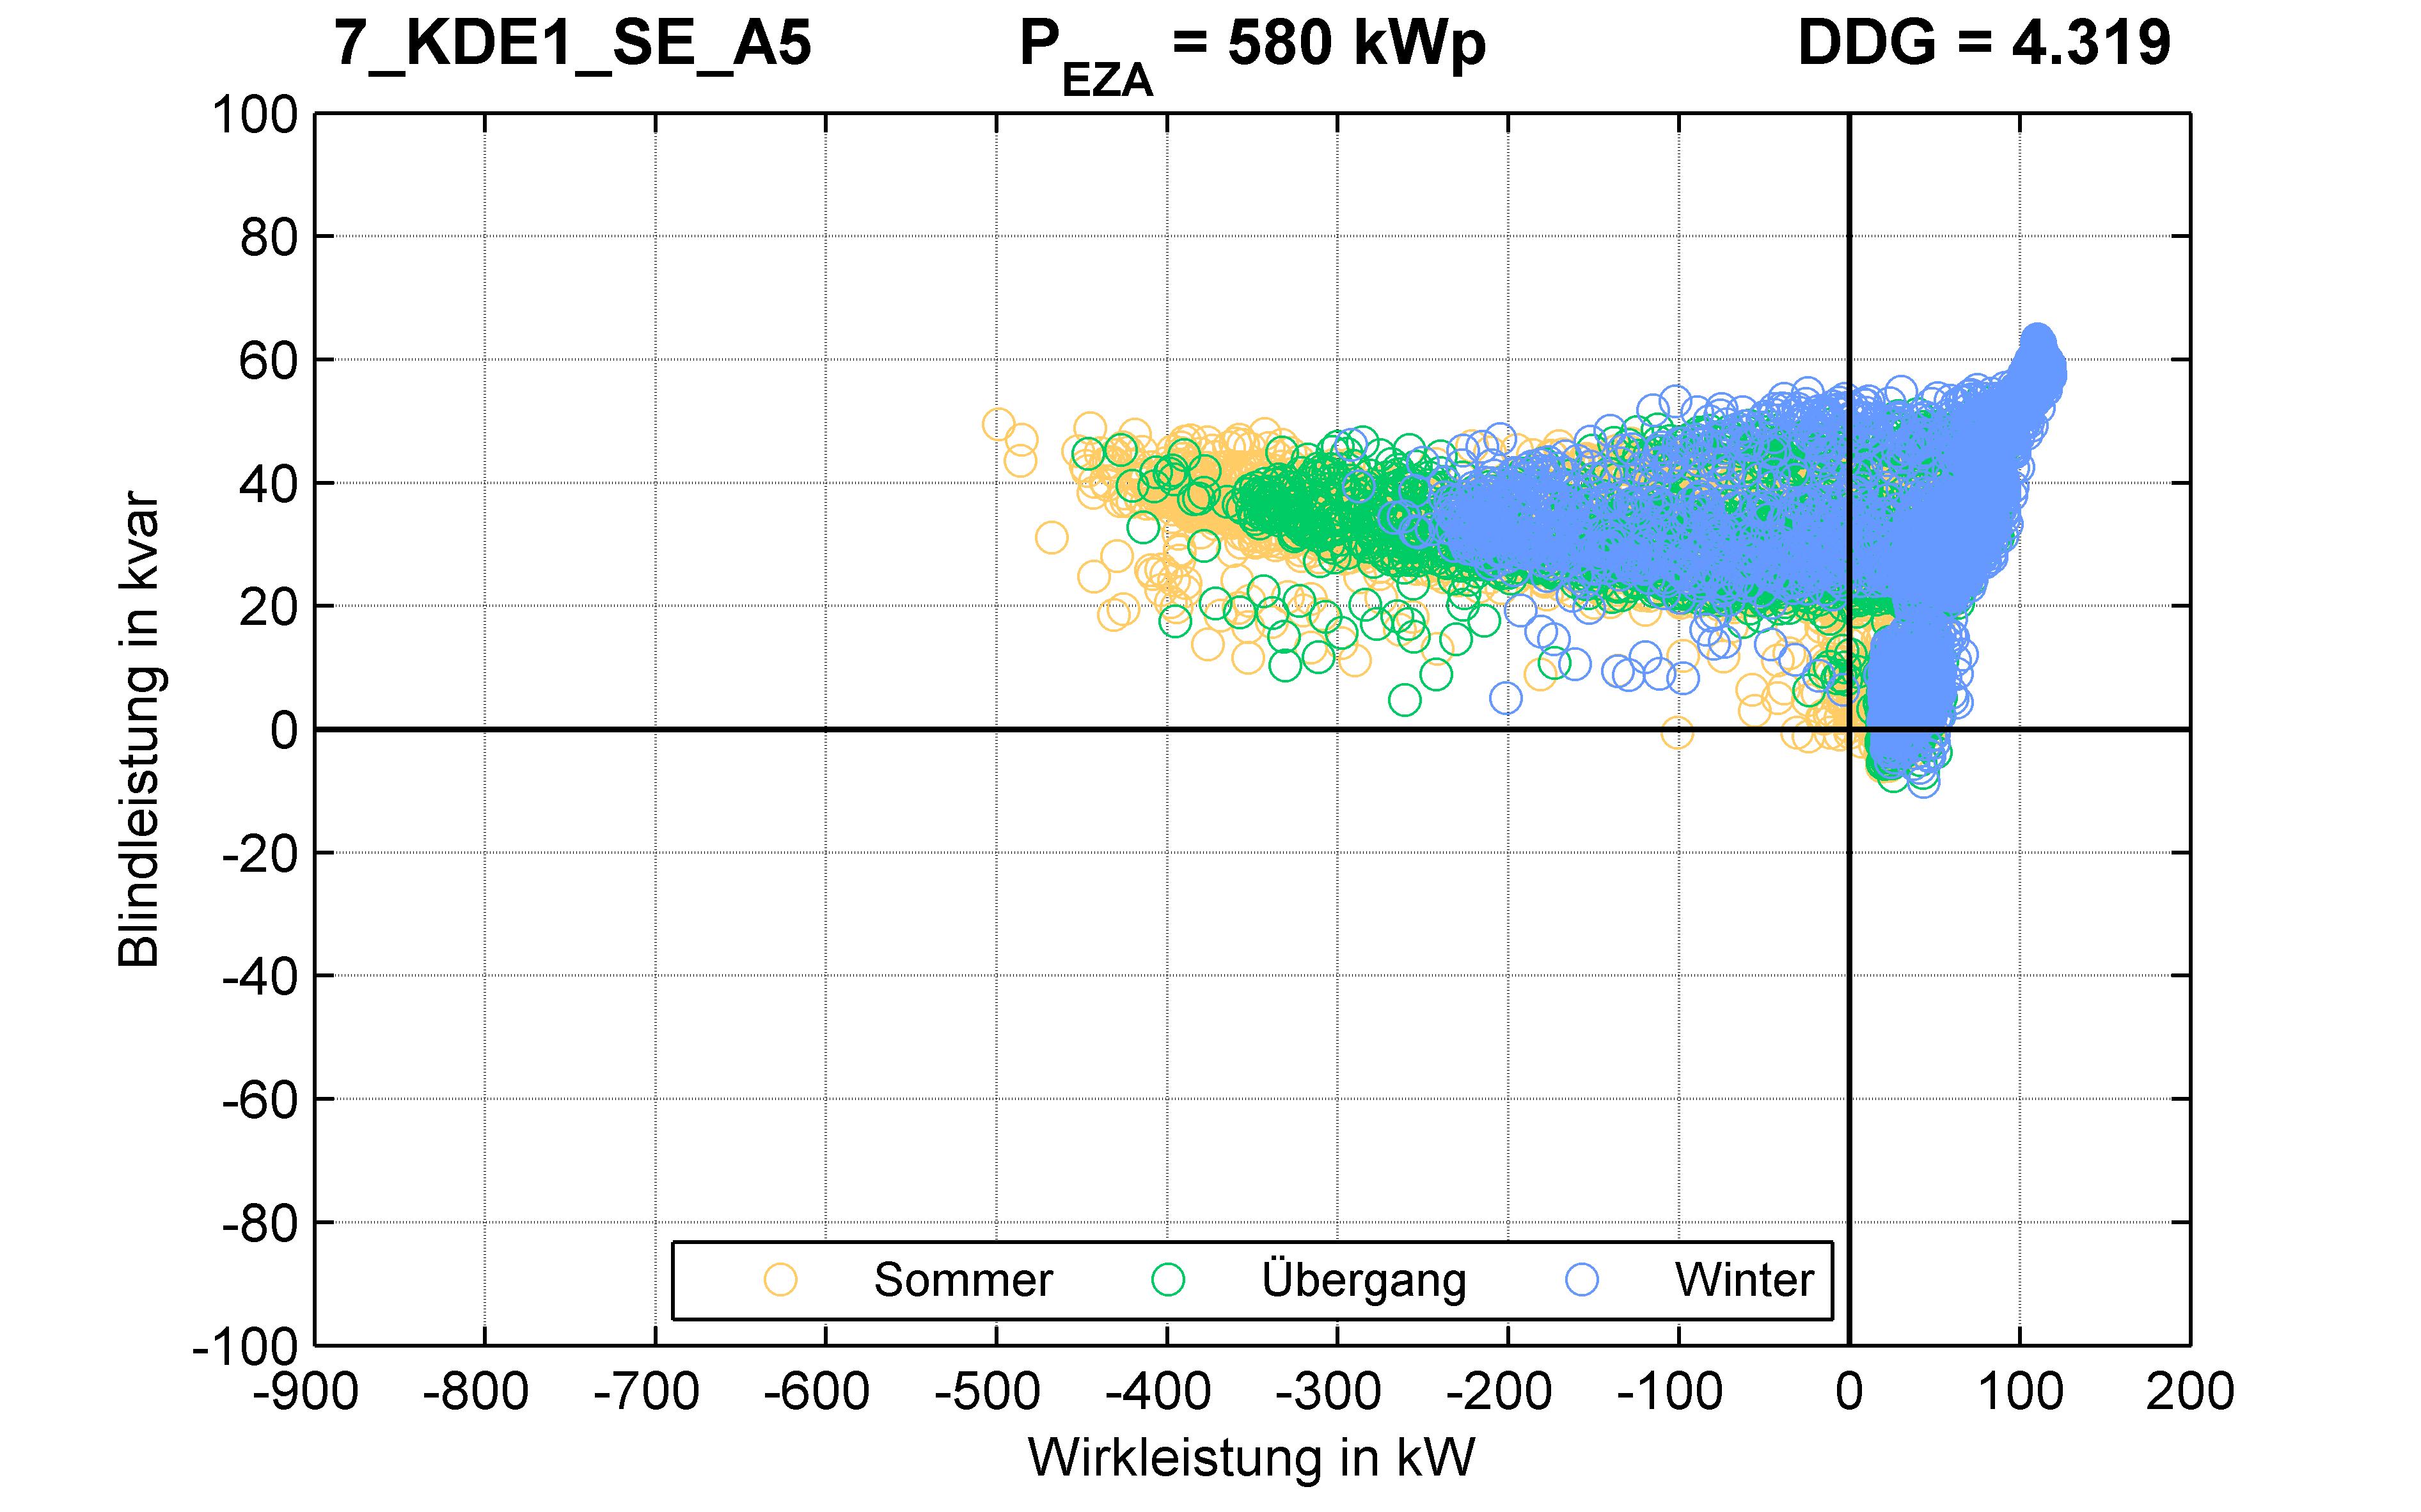 KDE1 | Längsregler (SE) A5 | PQ-Verhalten